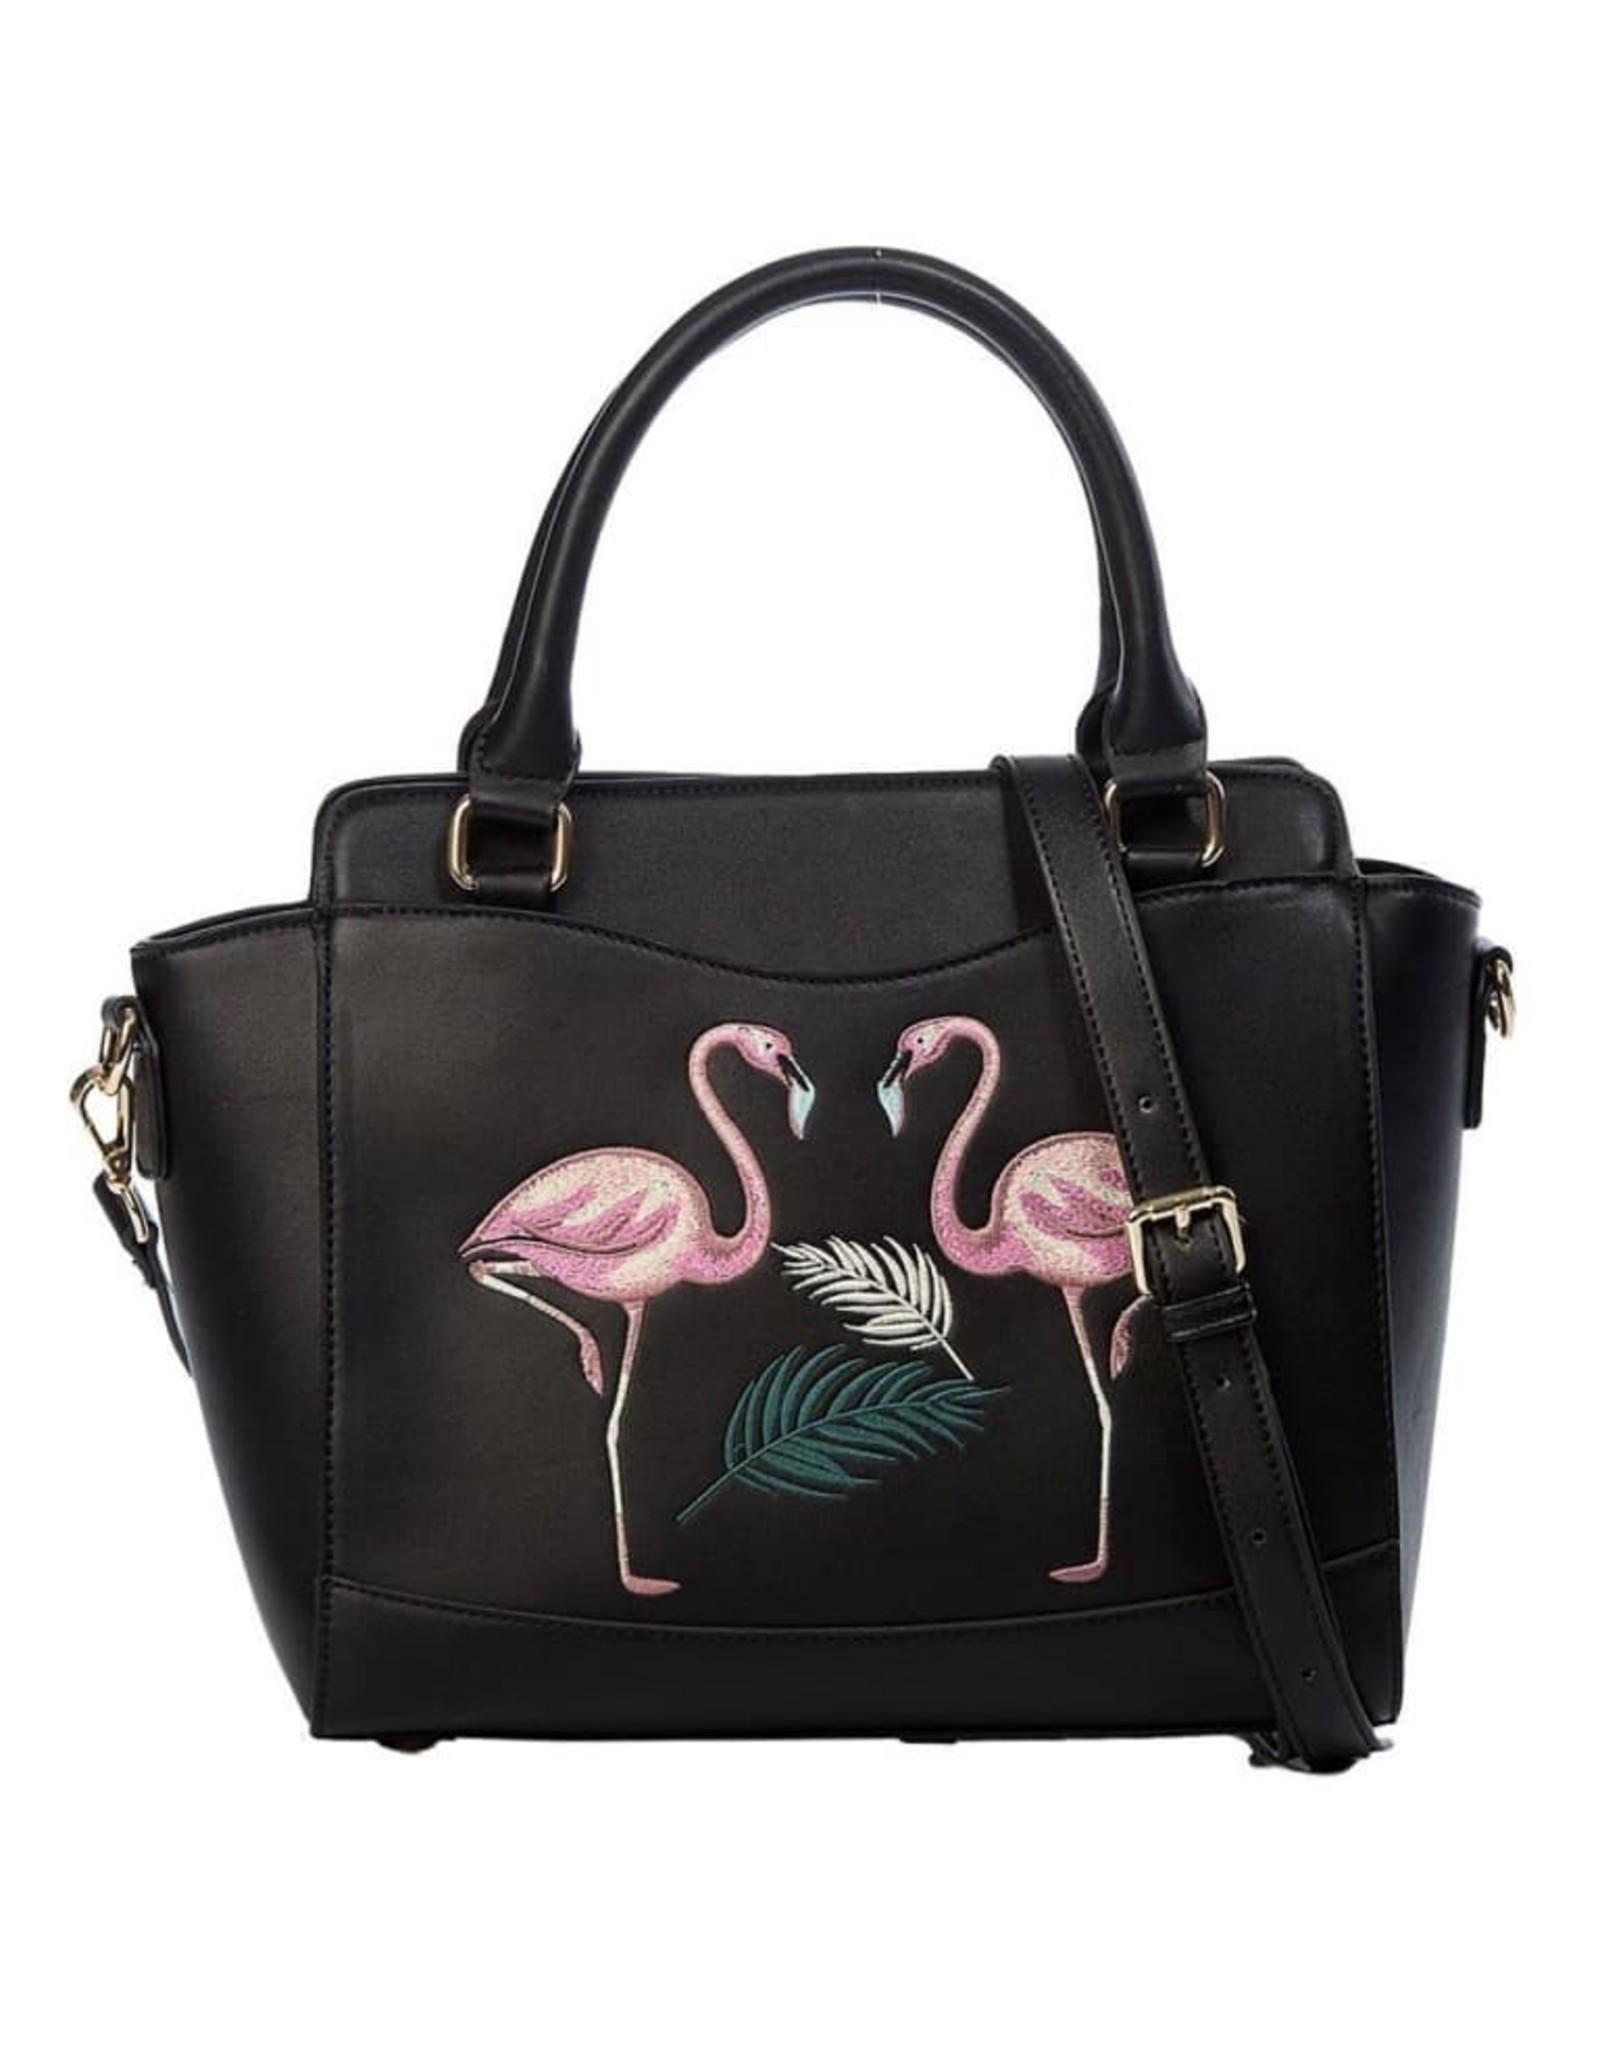 Banned Retro bags  Vintage bags - Banned Retro handbag Flamingo (black)